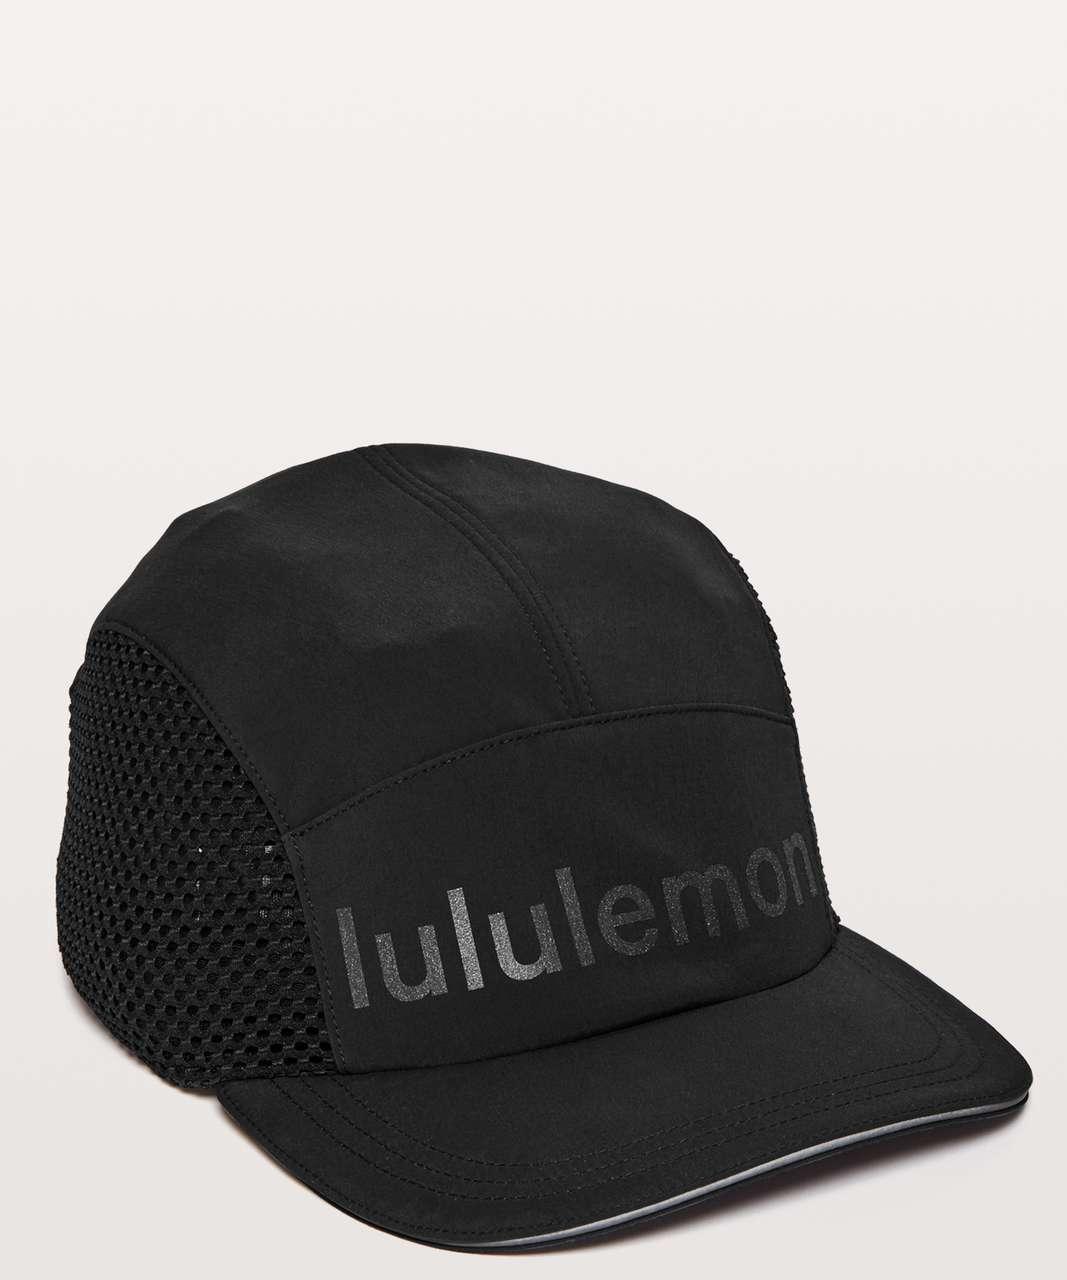 Lululemon Five Times Hat *Run - Black